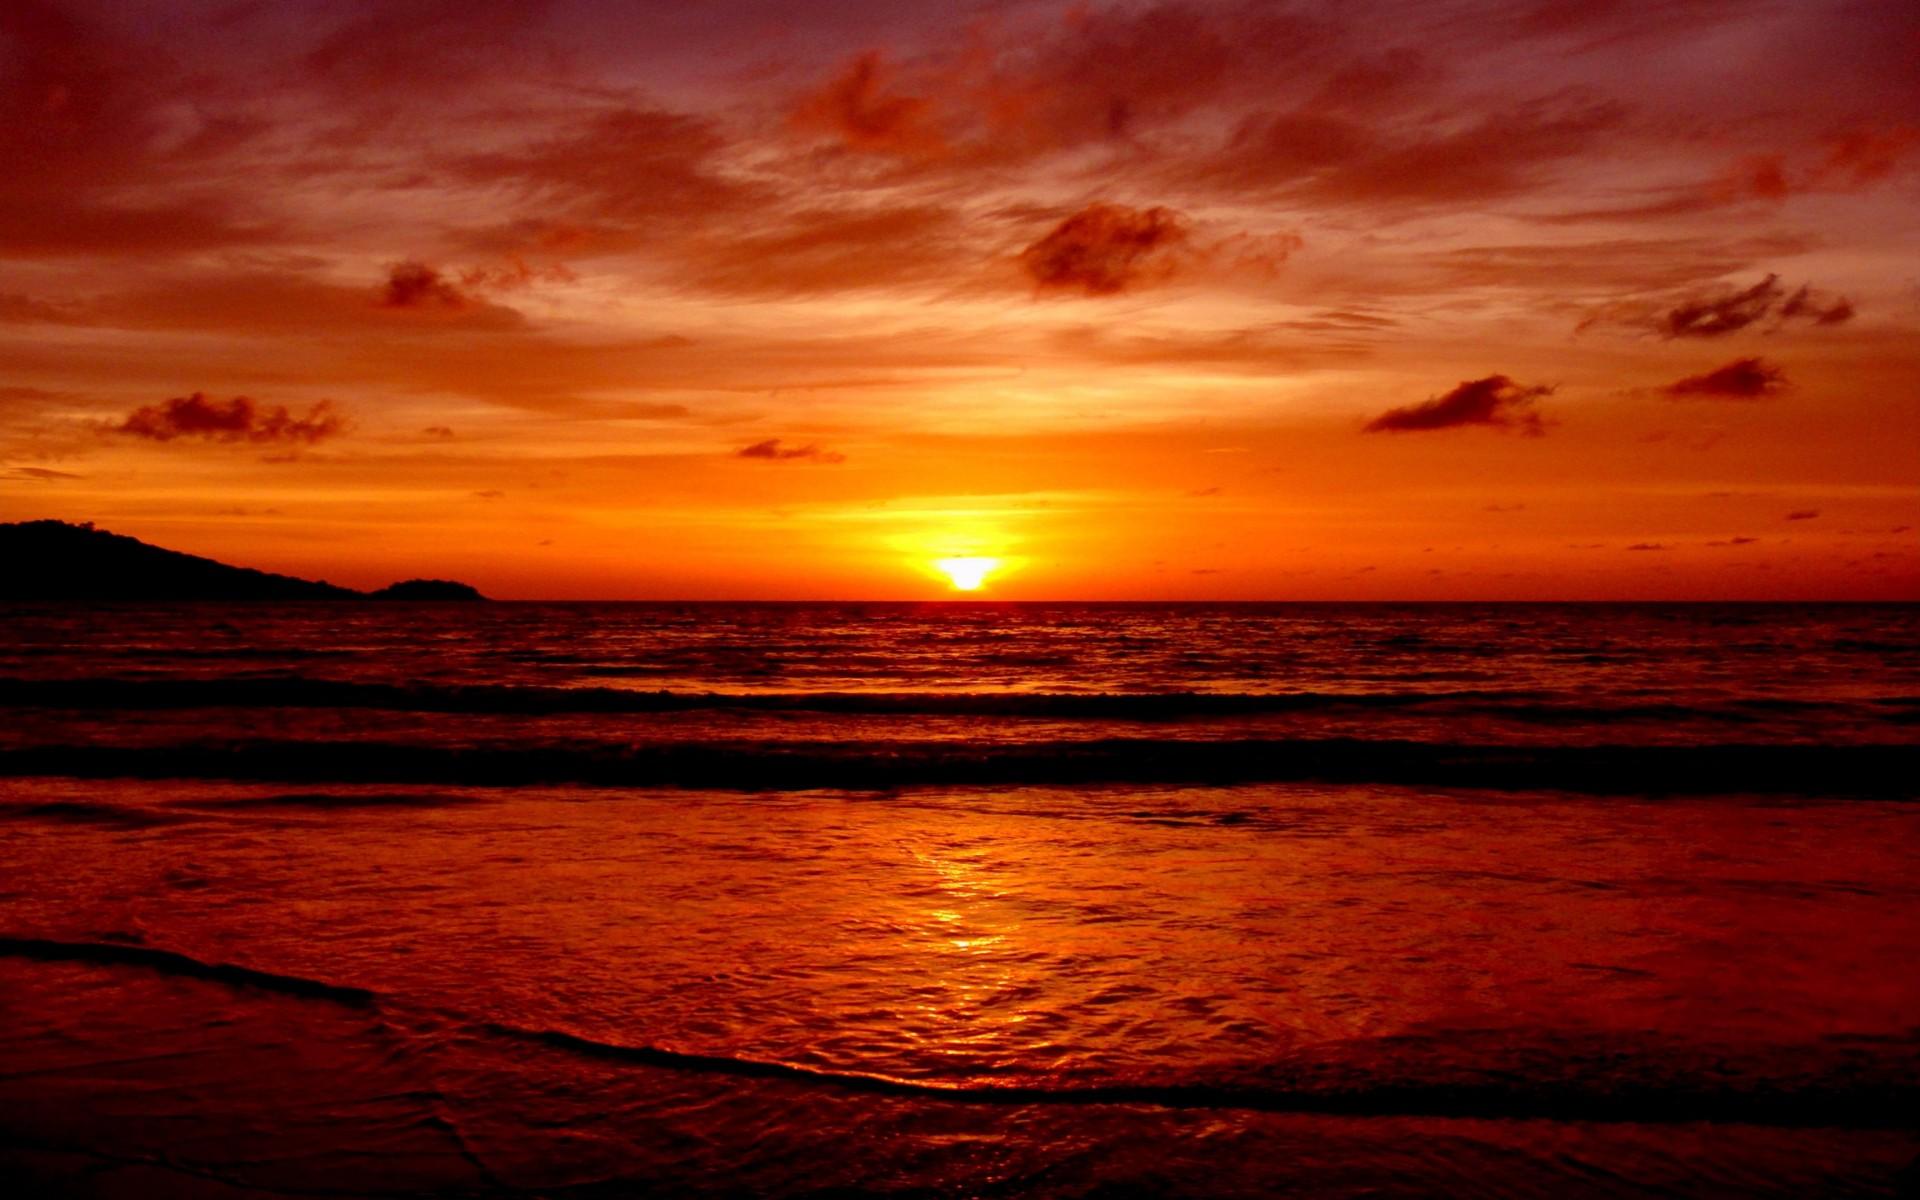 Peaceful Surf 4K Sunset Wallpapers 4K Wallpaper 1920x1200